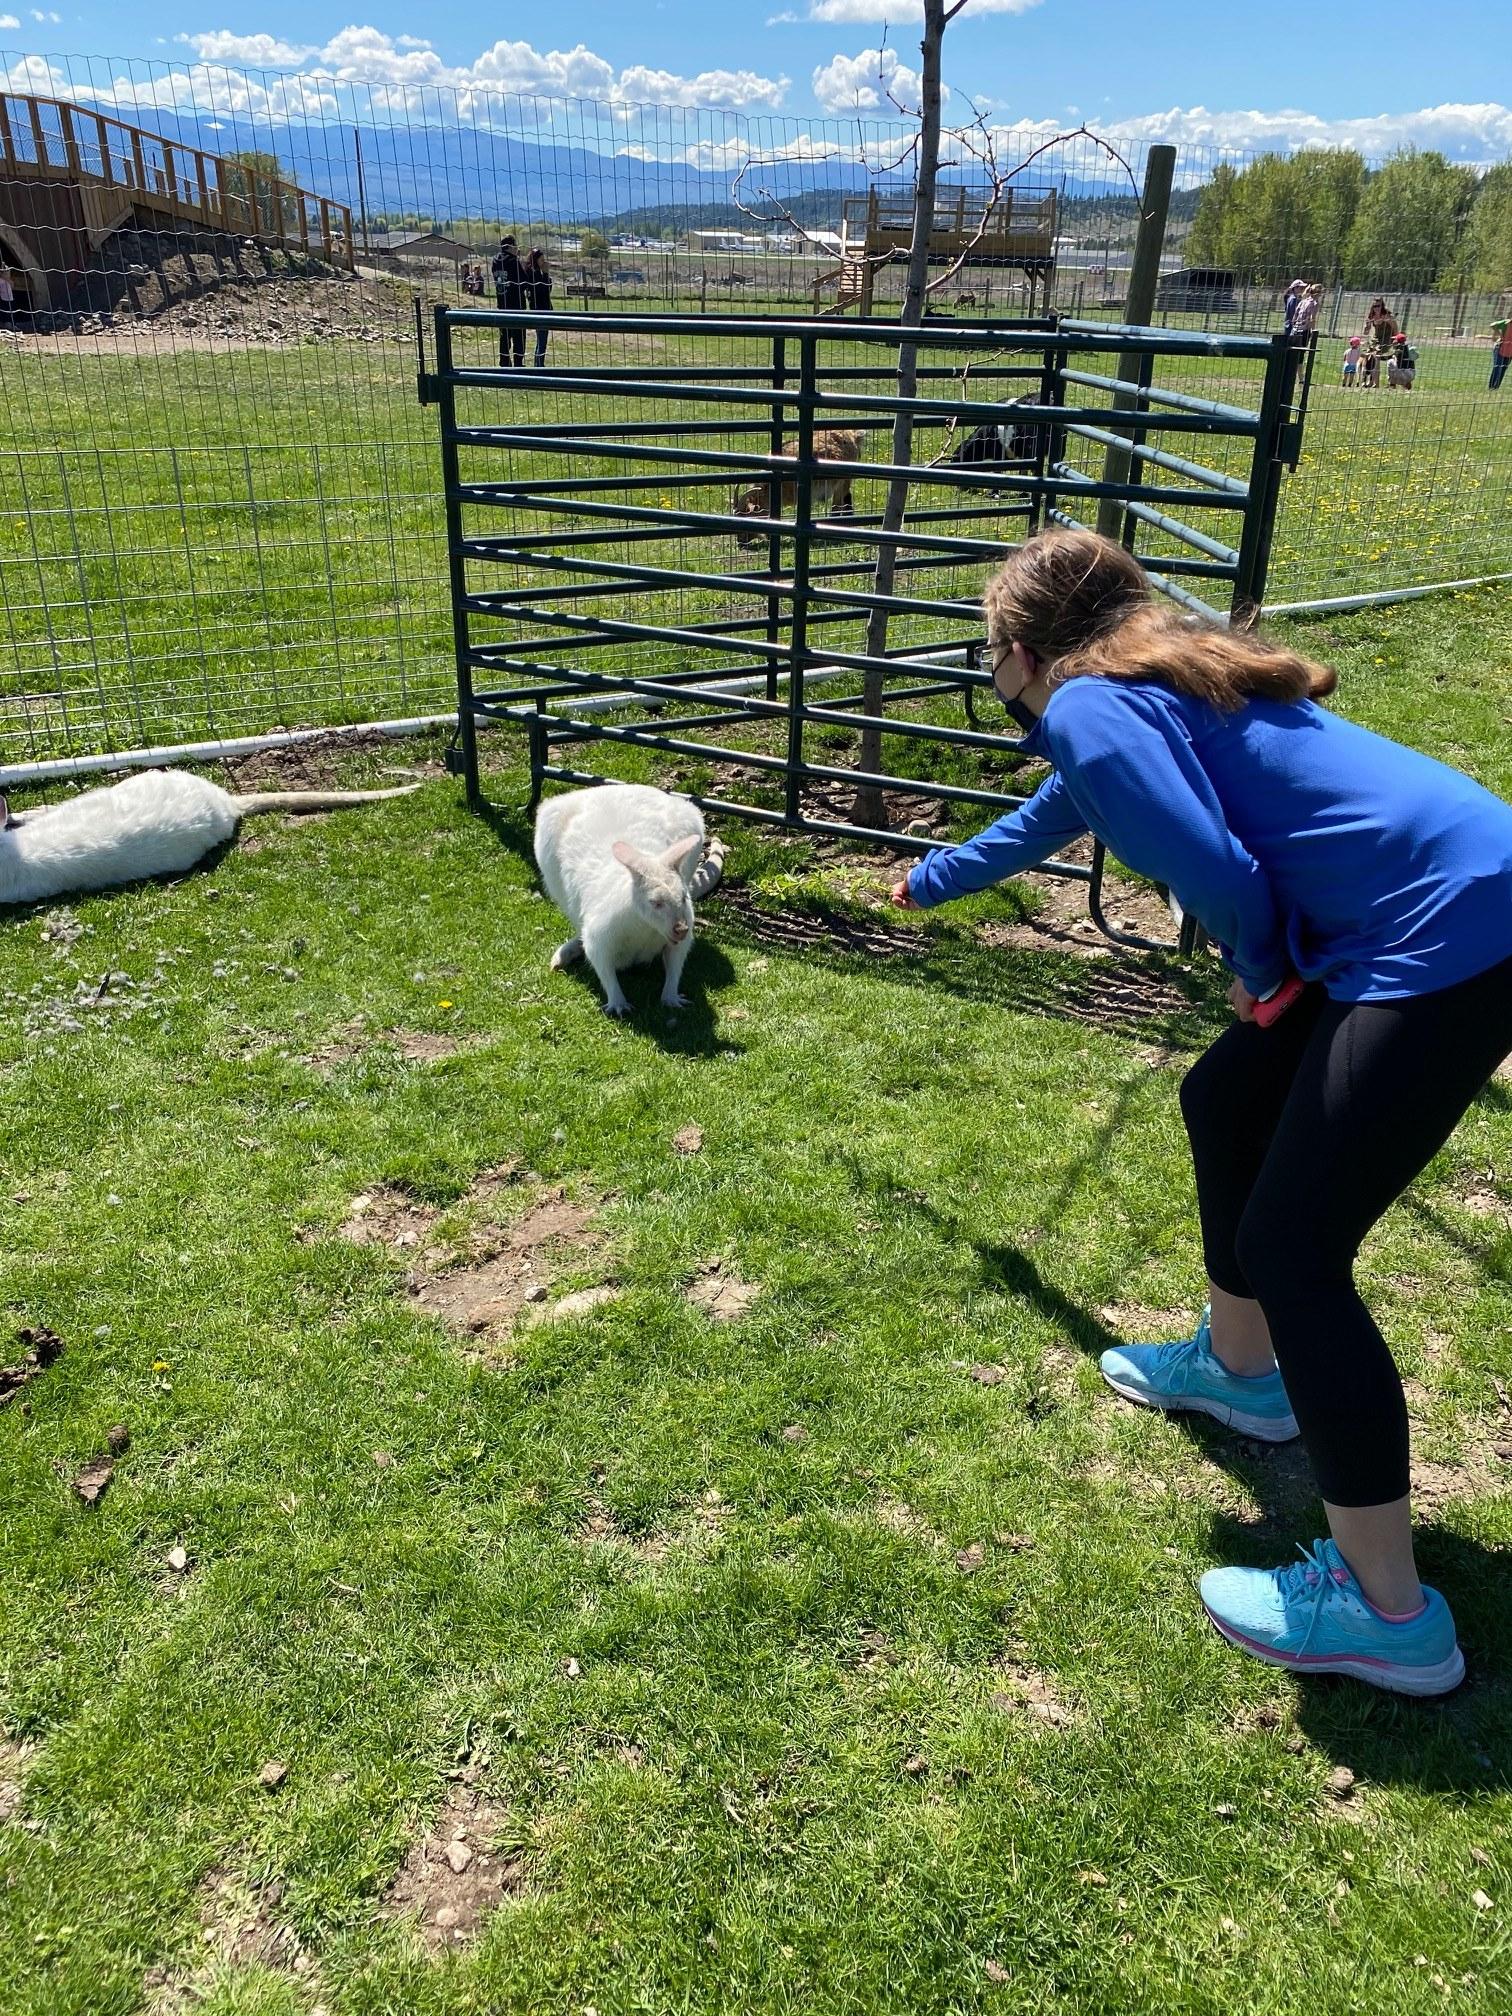 Small Business Spotlight and Tourism Week: Kangaroo Creek Farm